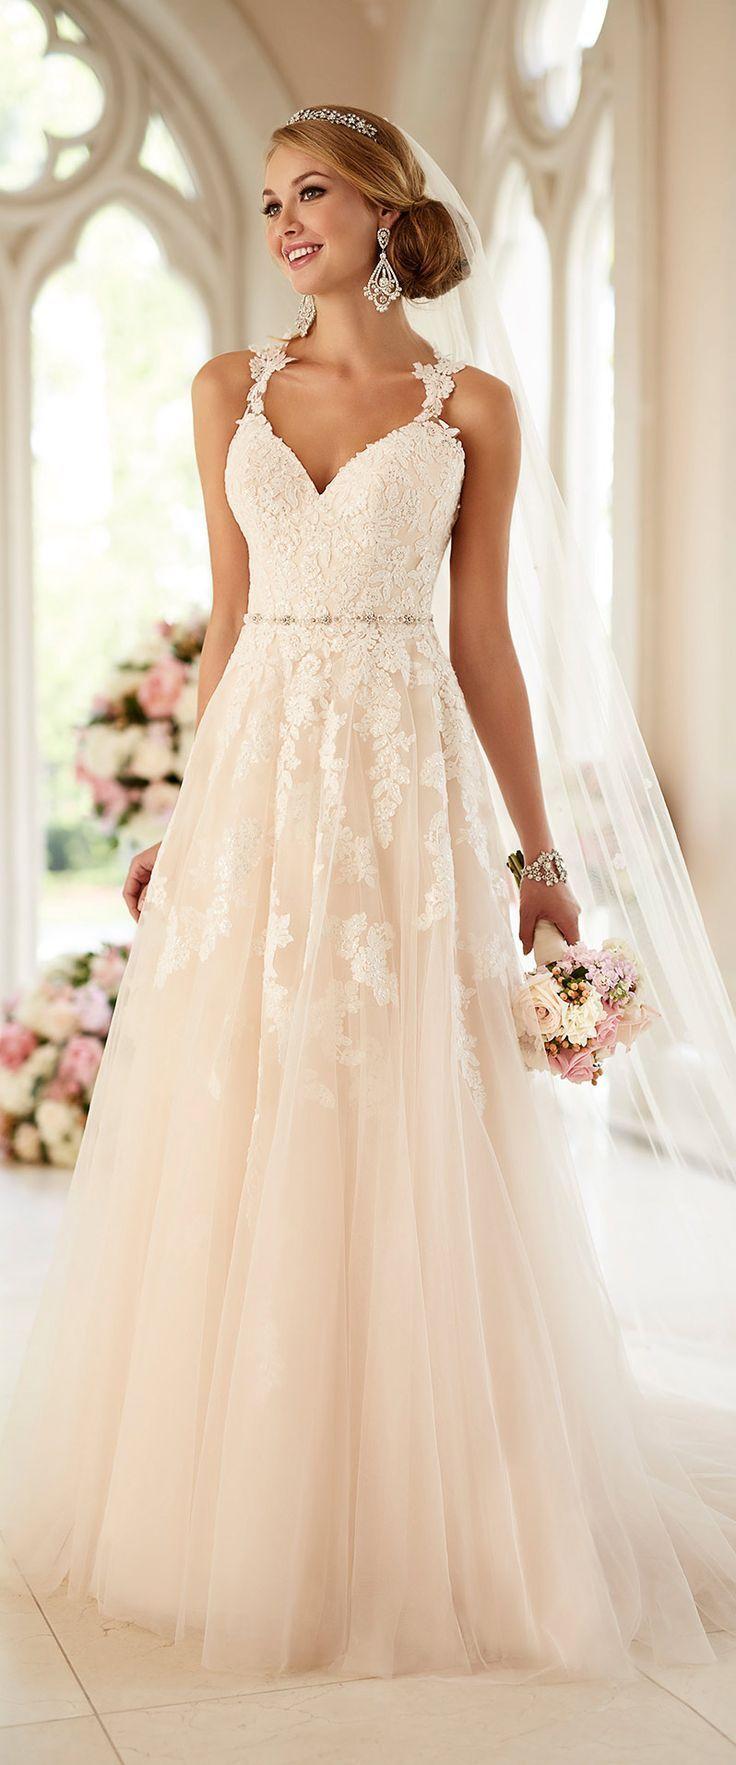 colored wedding dresses princess wedding dress pulchritudinous wedding dresses lace ballgown princesses strapless